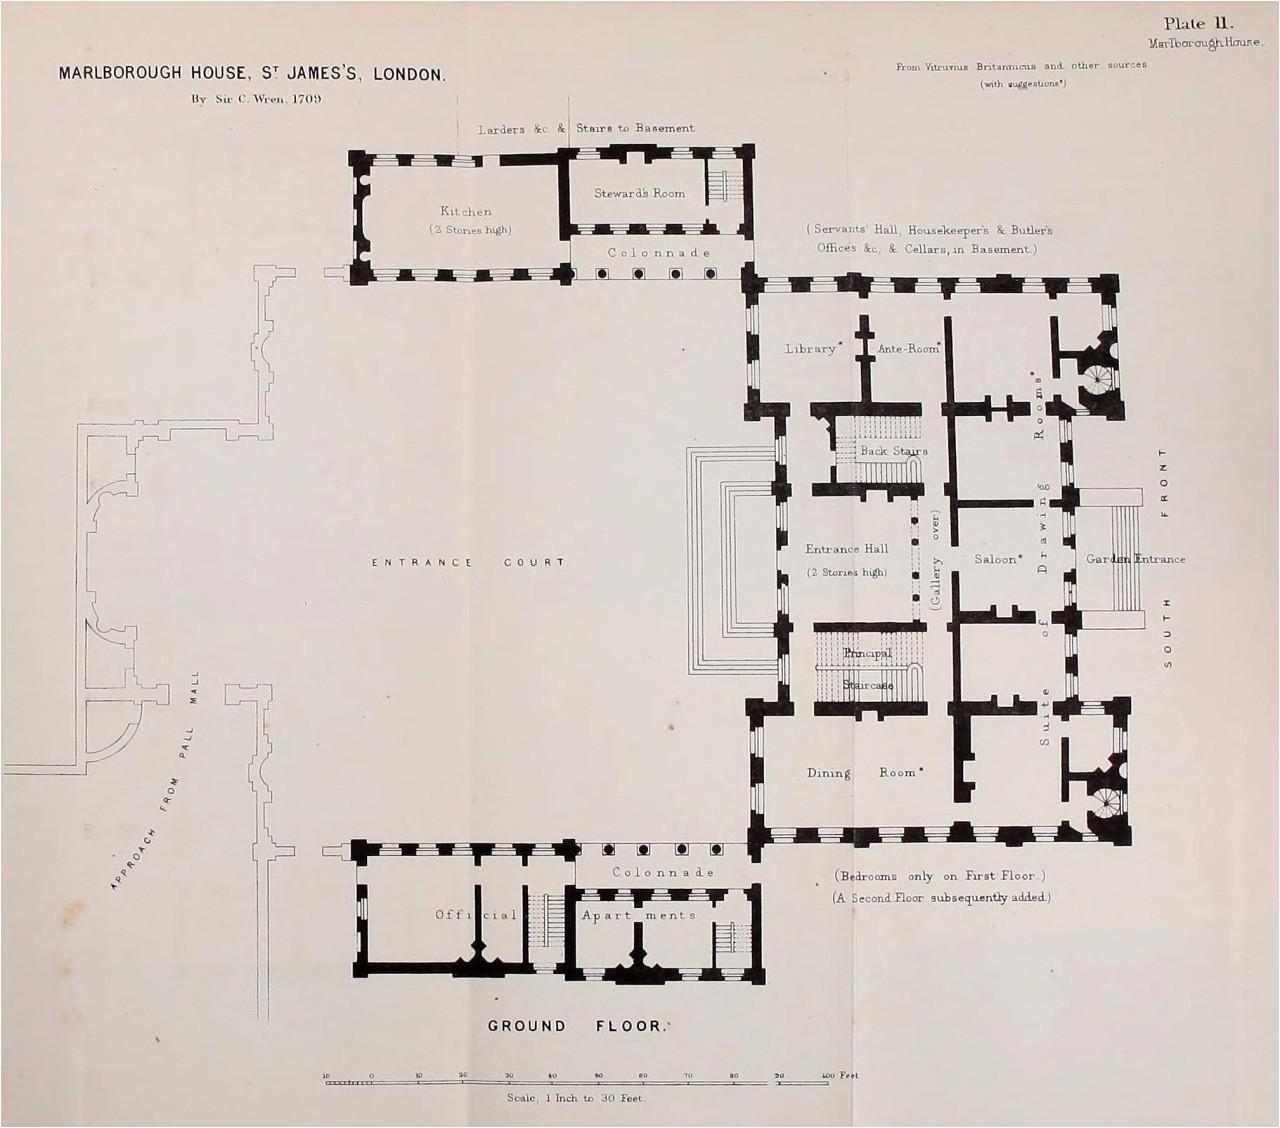 floor plan of marlborough house london